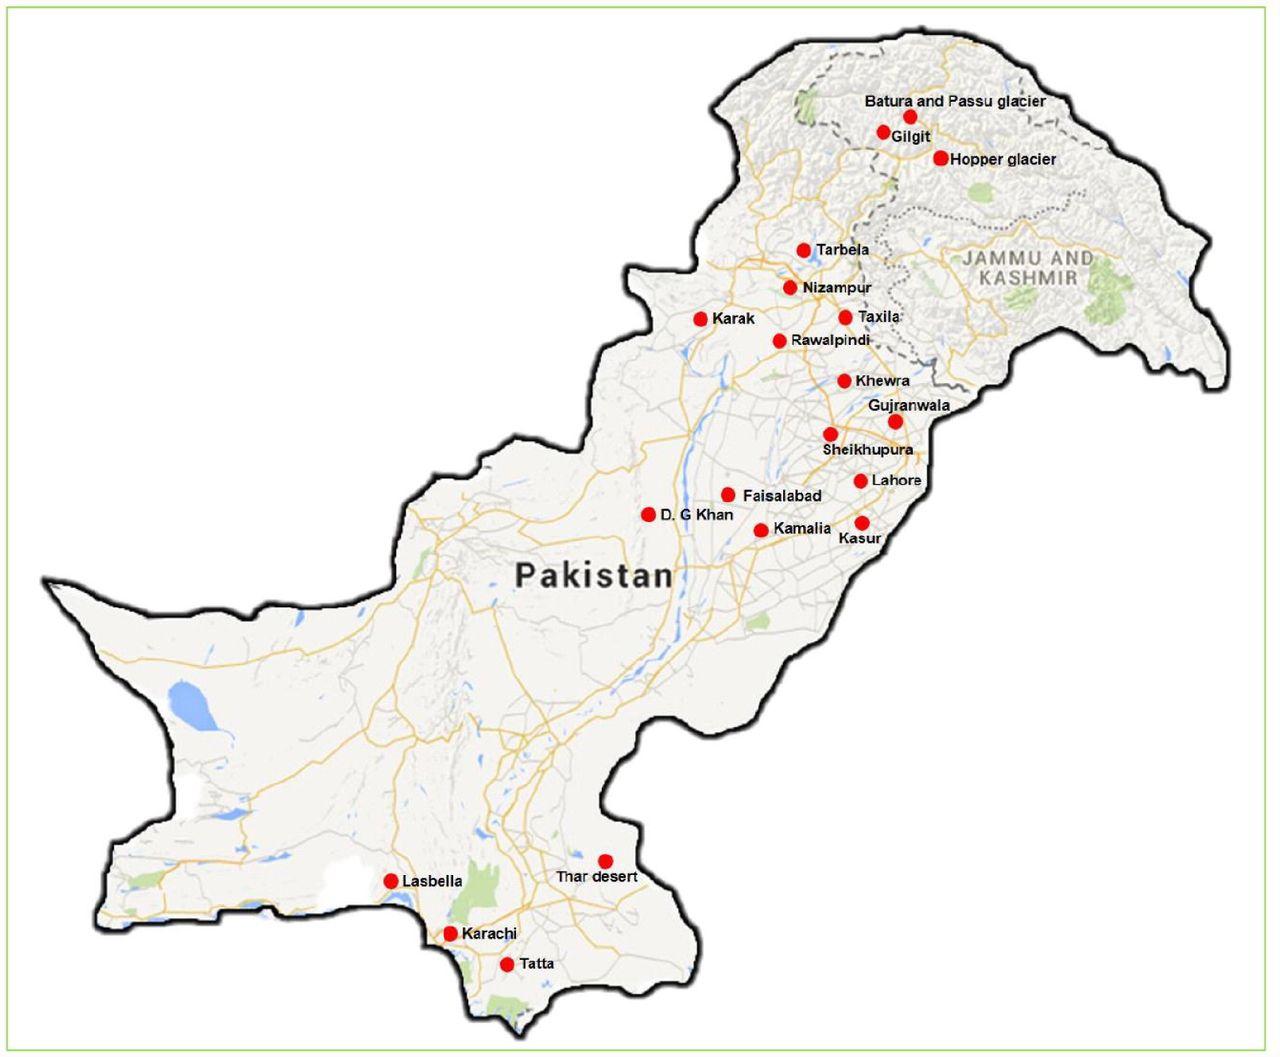 Prokaryotic Diversity from Extreme Environments of Pakistan